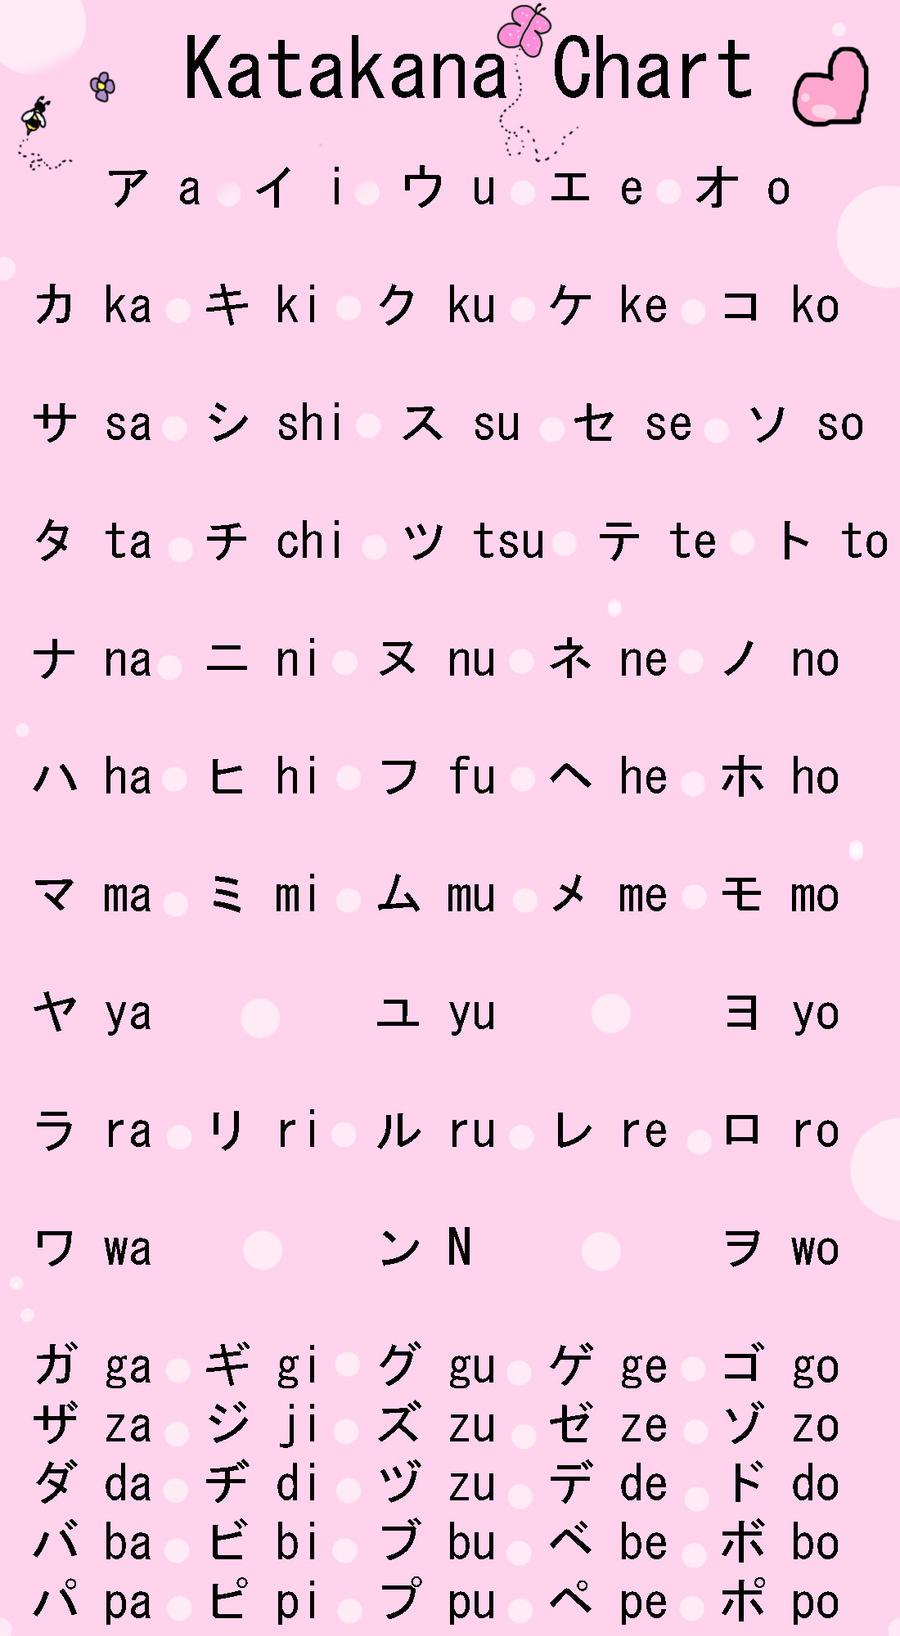 katakana chart by kawaii4life on deviantart